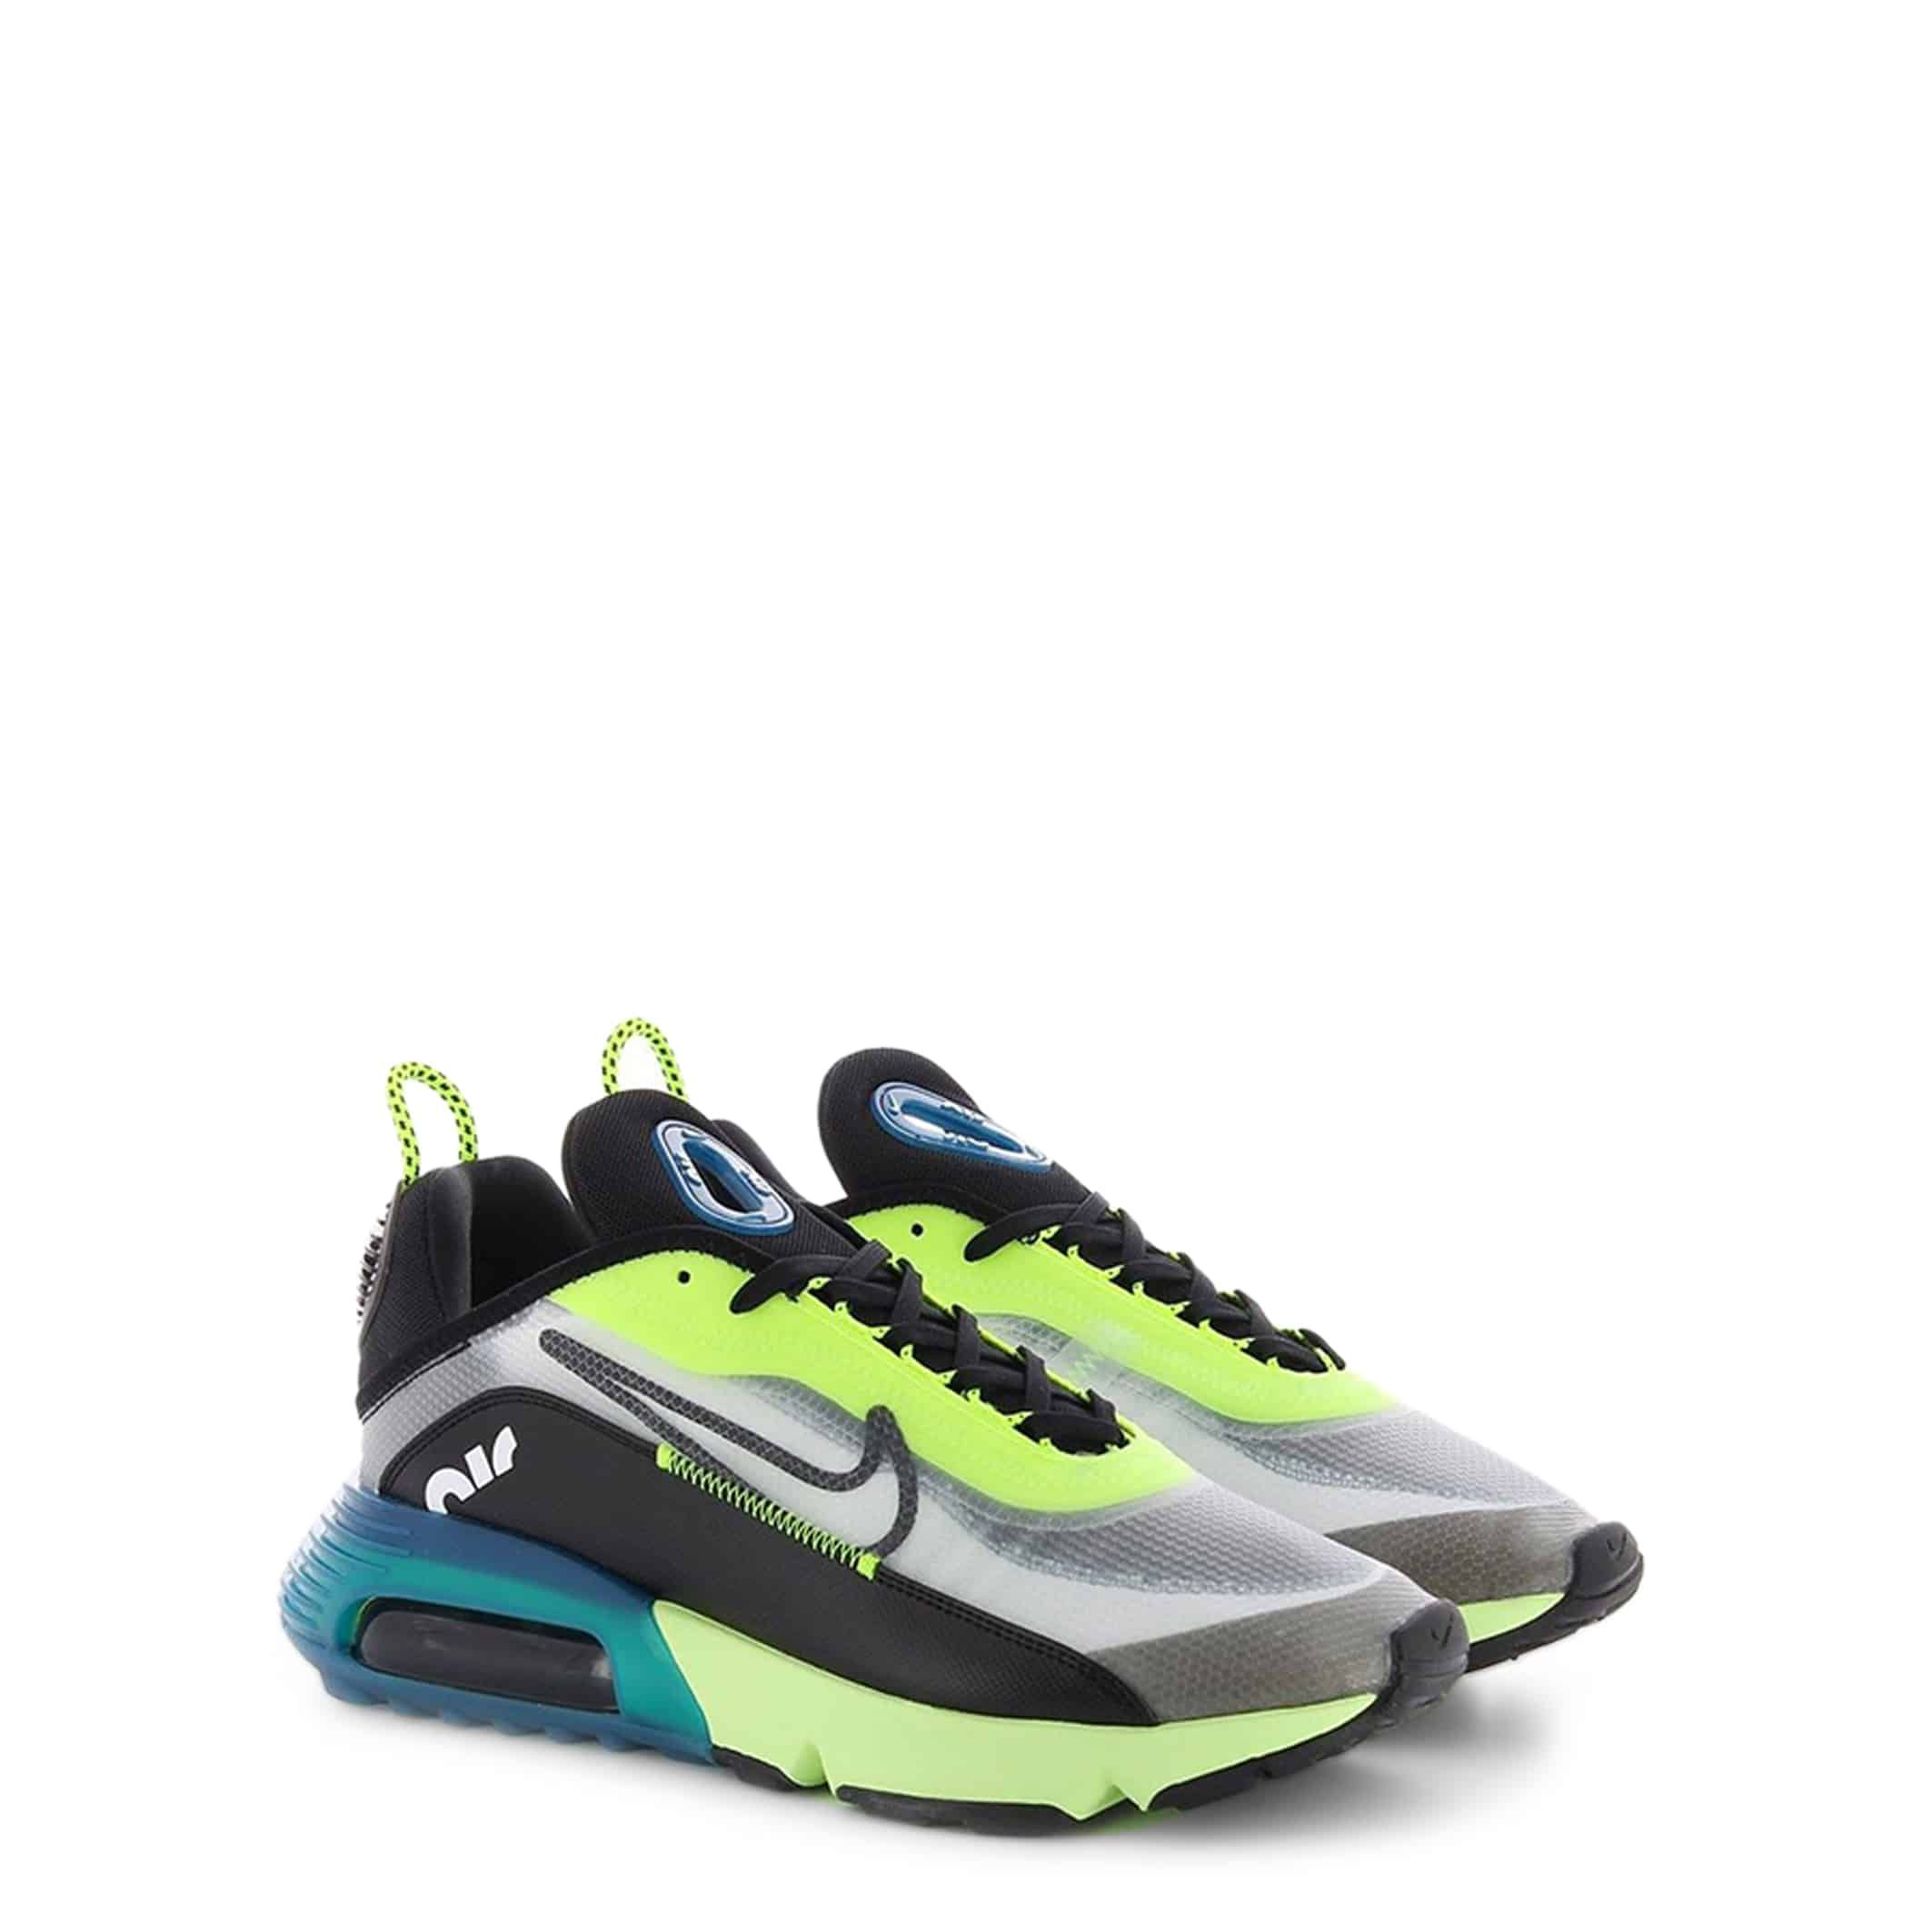 Nike – AirMax2090 – Blanco